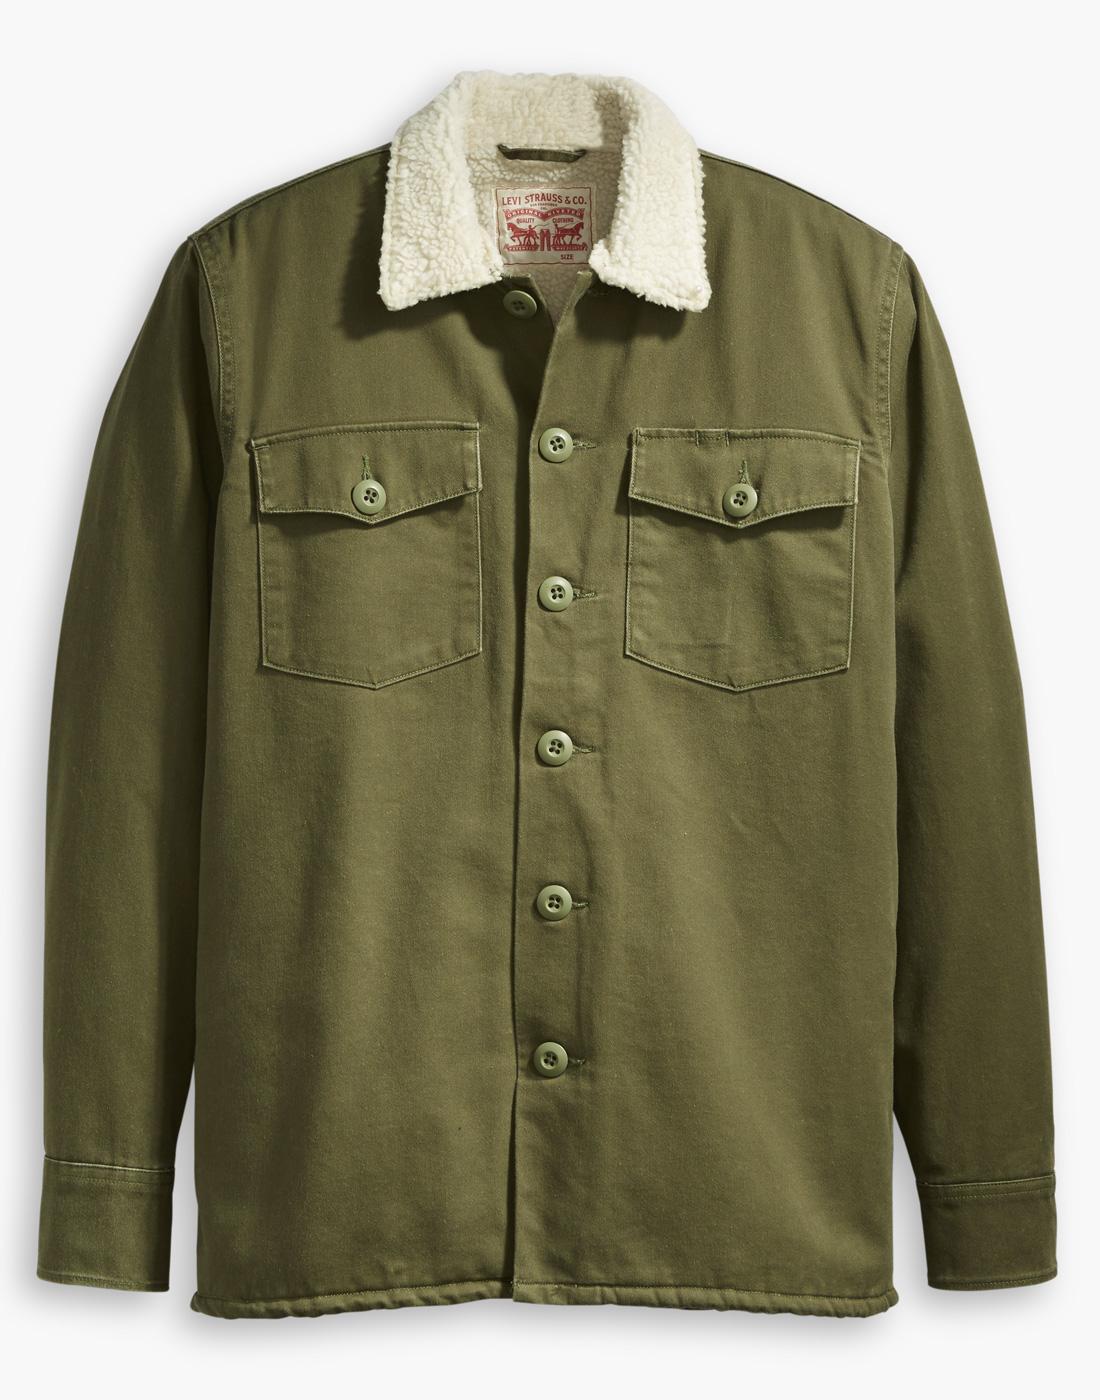 LEVI'S Men's Retro 70s Mod Military Sherpa Jacket